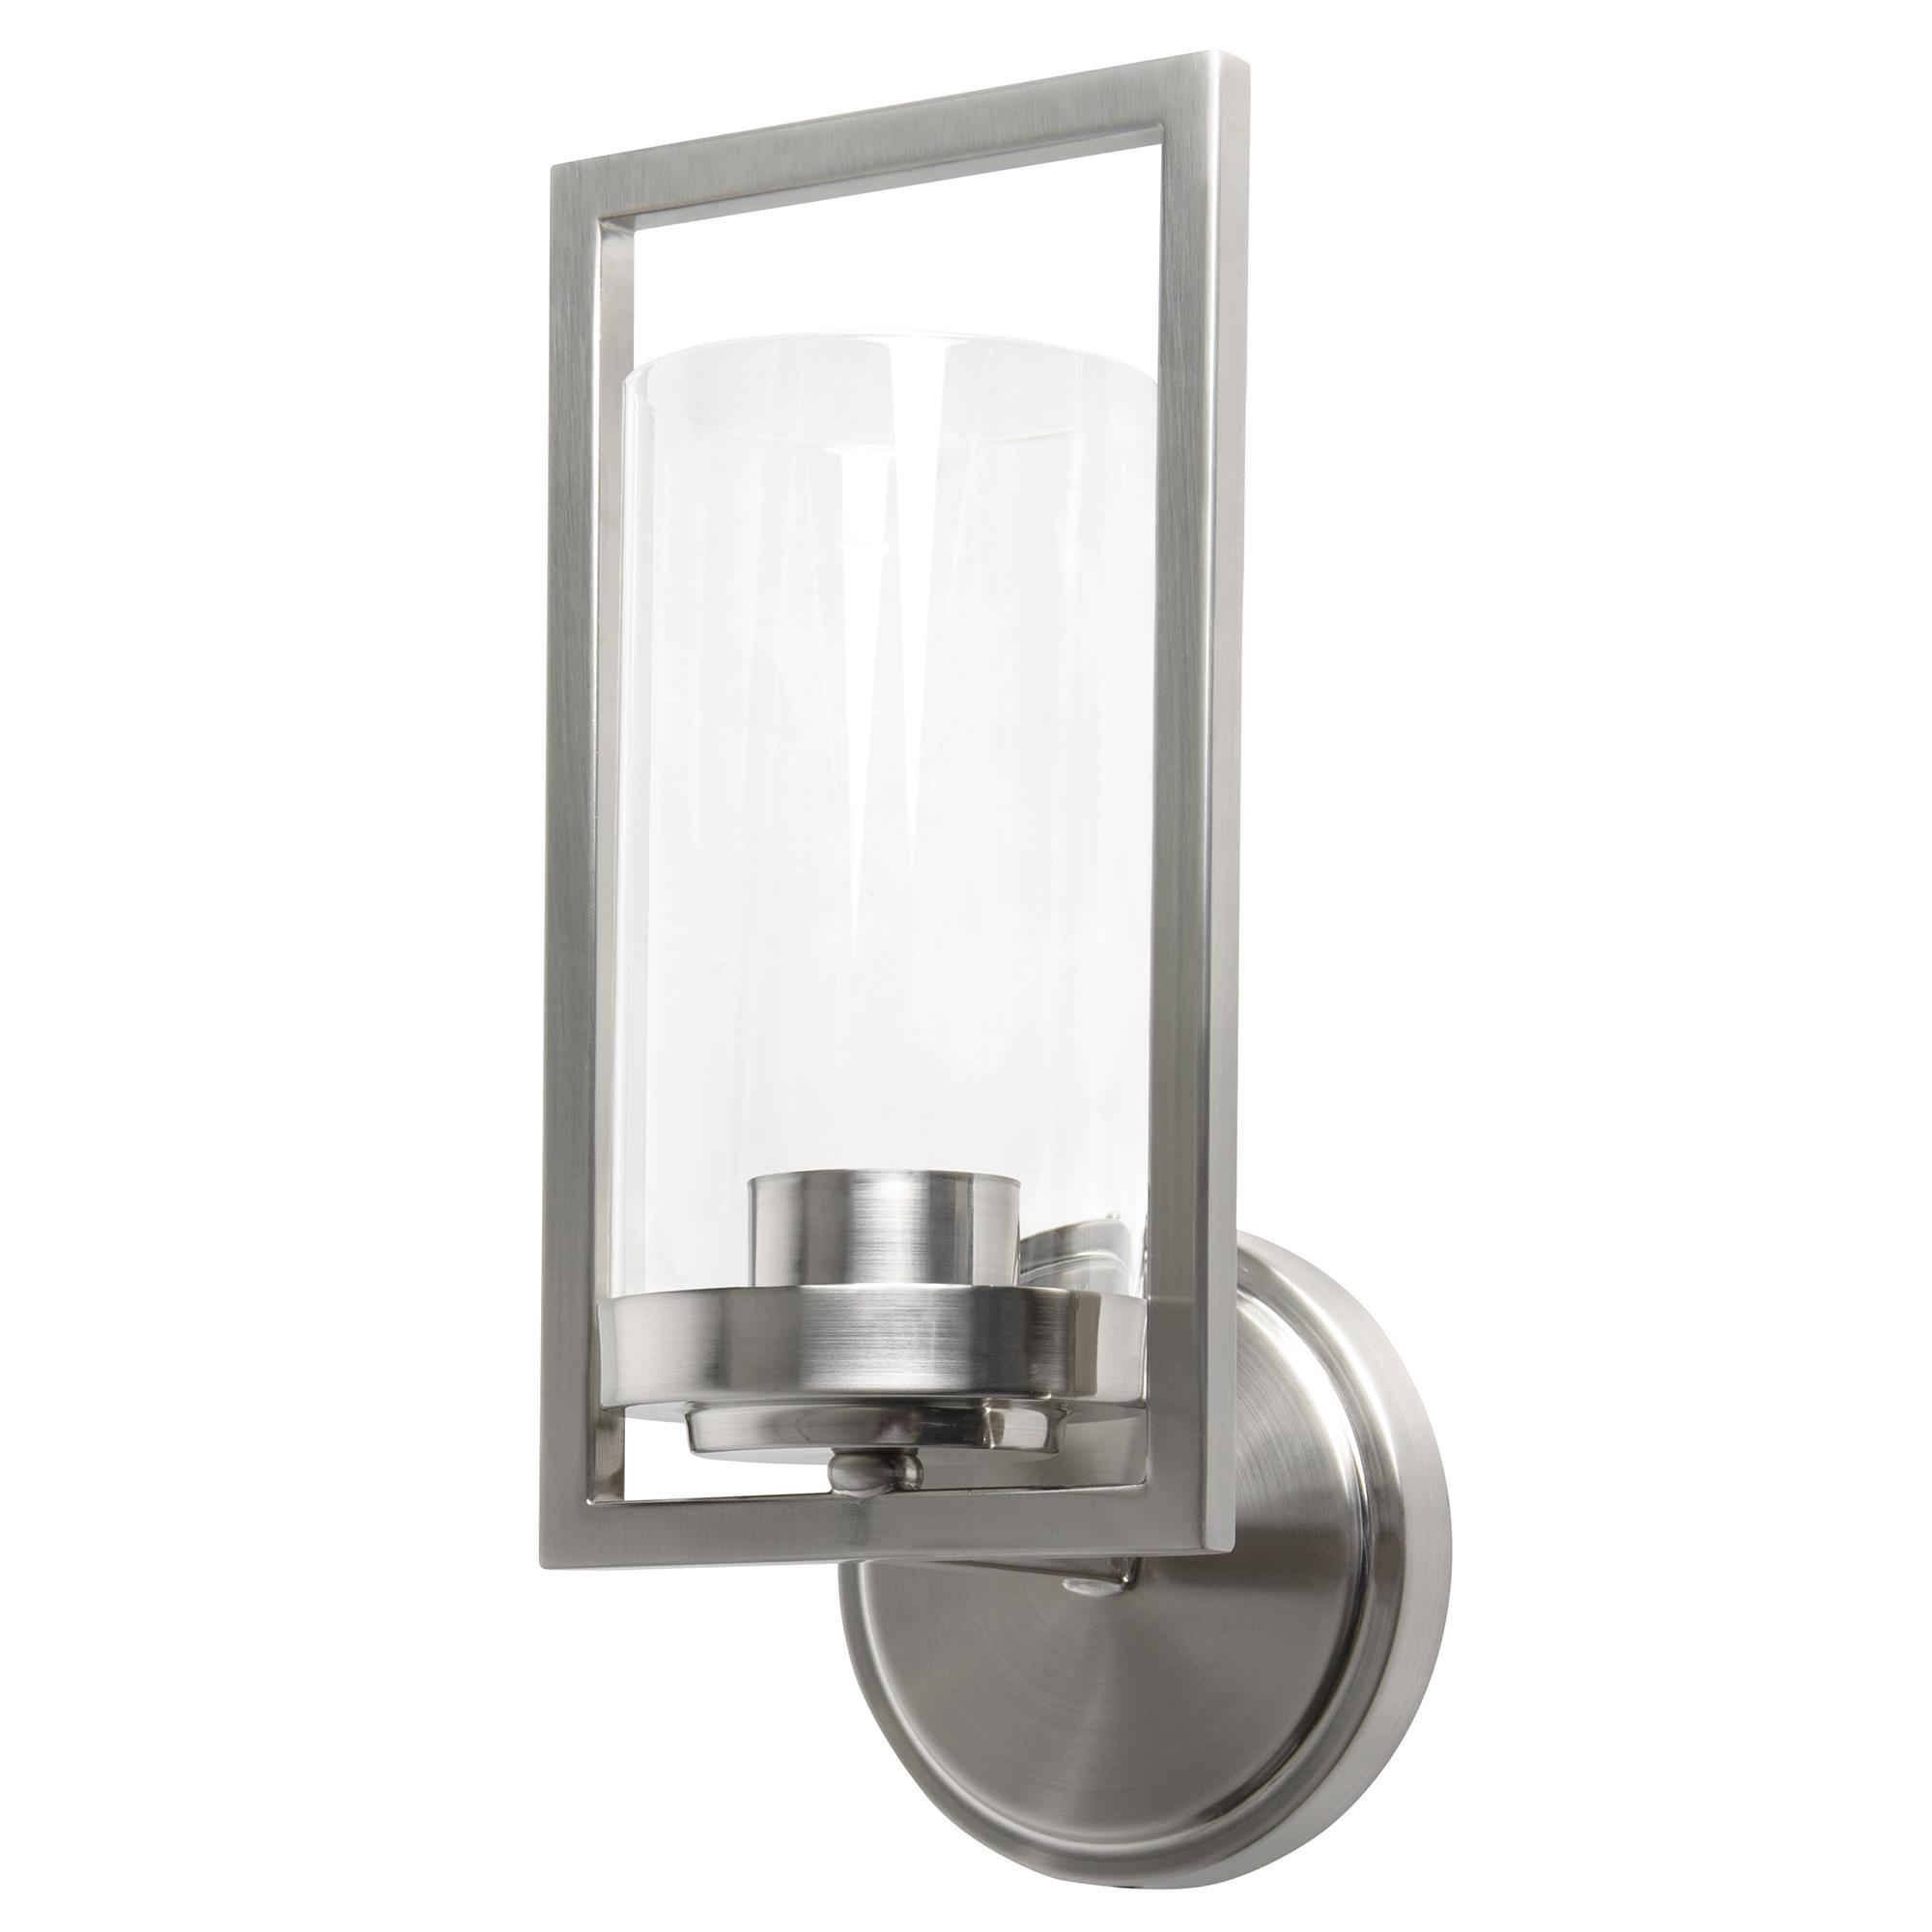 Sunset Lighting Prestige One Light Wall Sconce - in Bright Satin Nickel, Glass, 1 Bulb